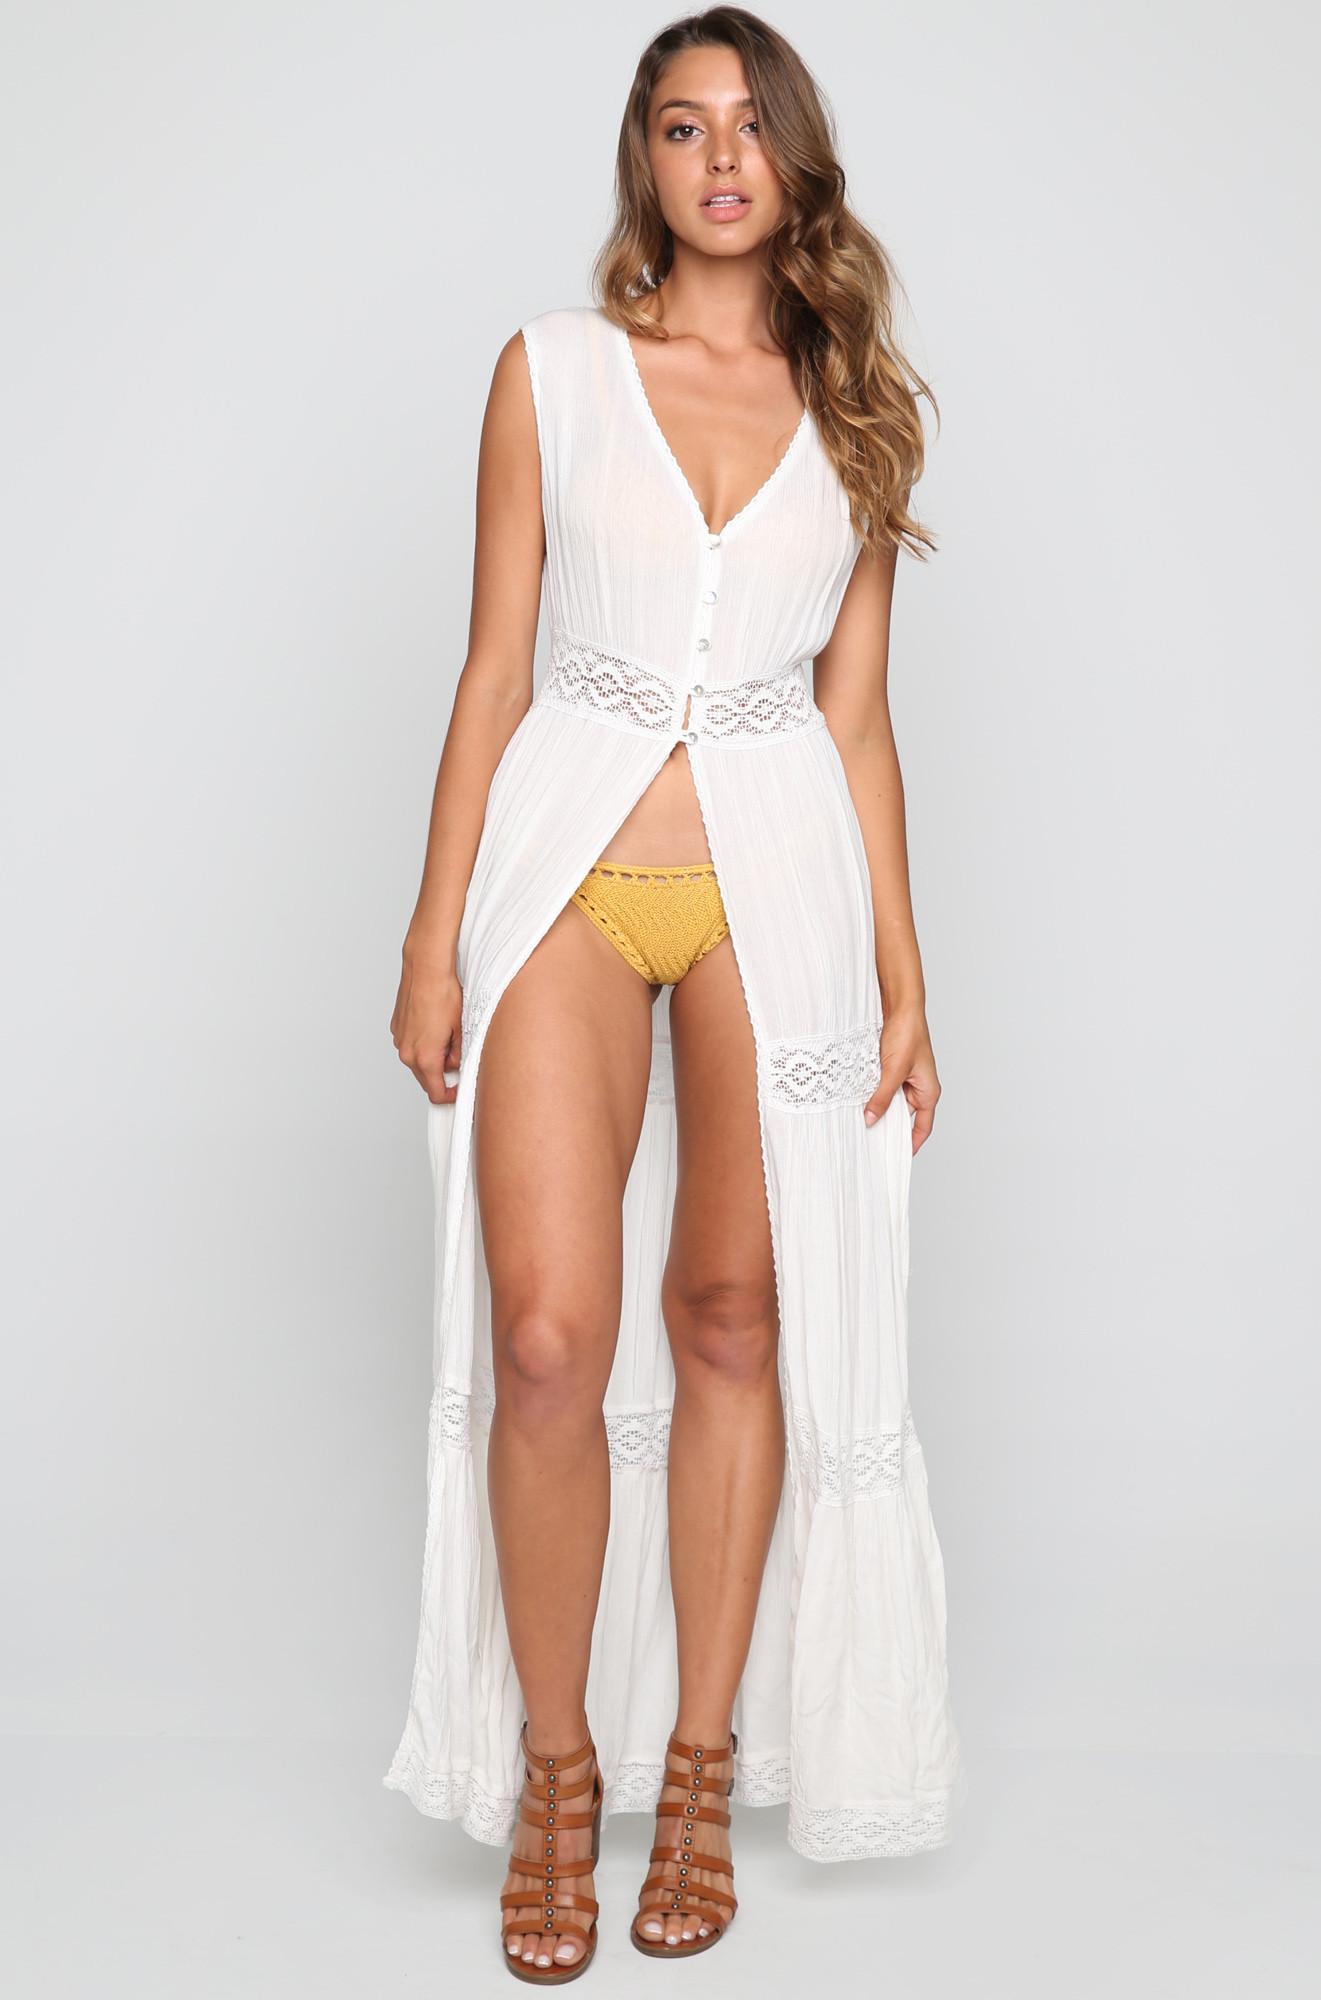 Feet Celine Farach nudes (68 foto and video), Tits, Bikini, Instagram, see through 2019